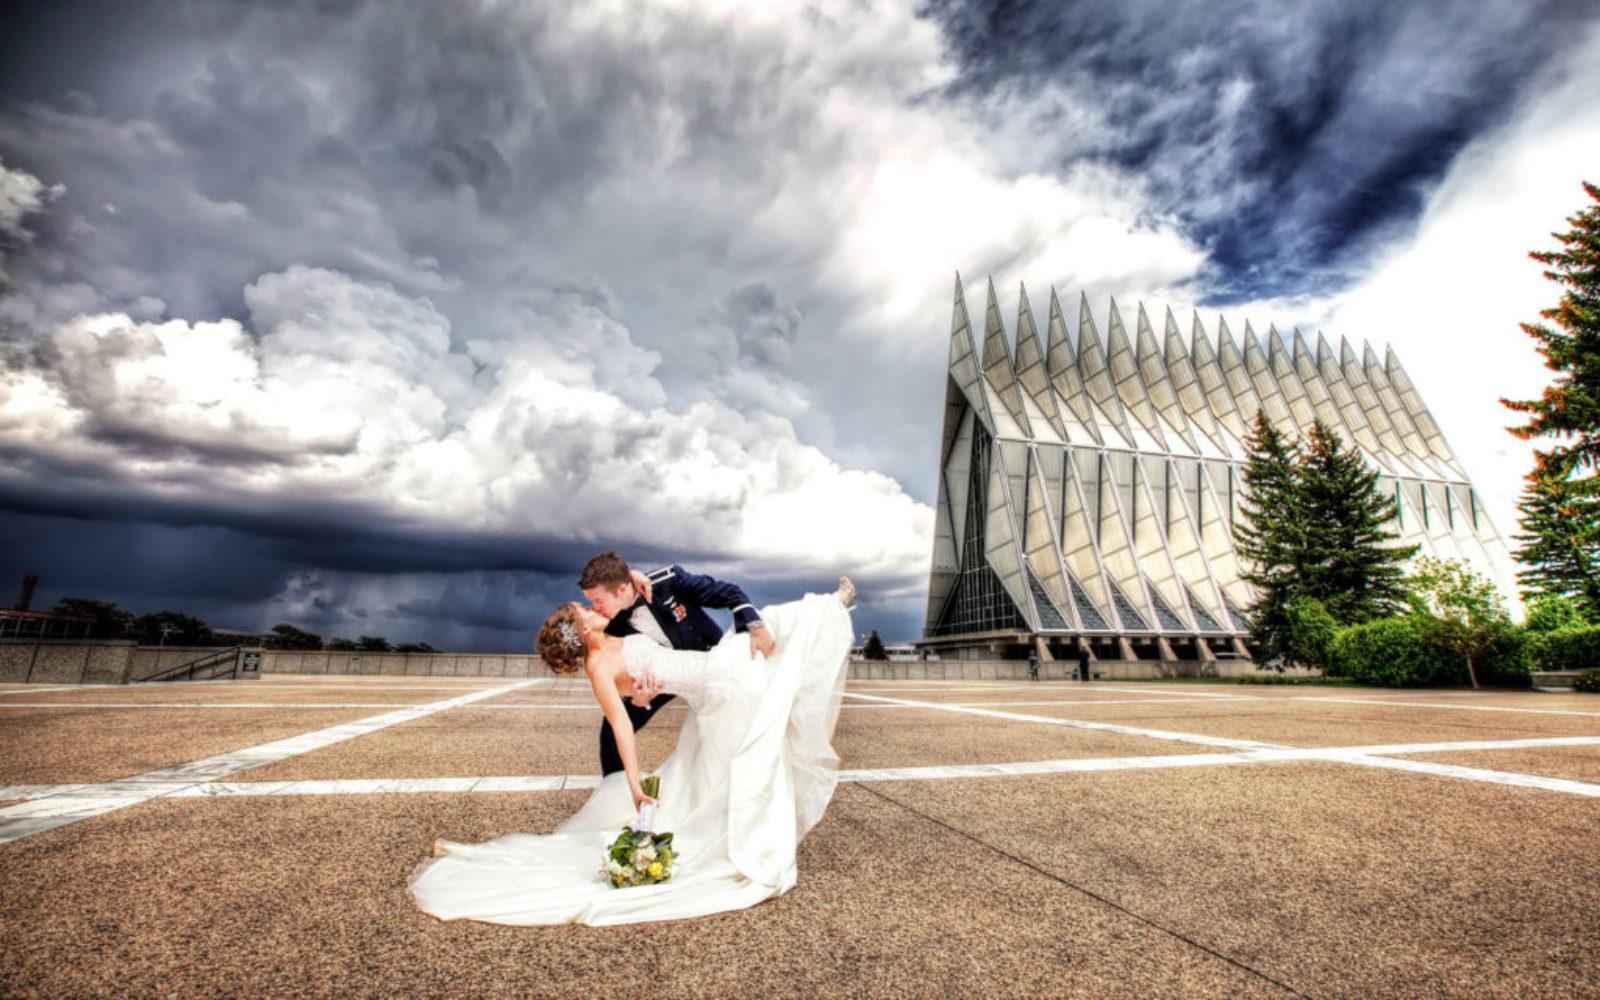 weddingphotographycoloradosprings_58-1024x640